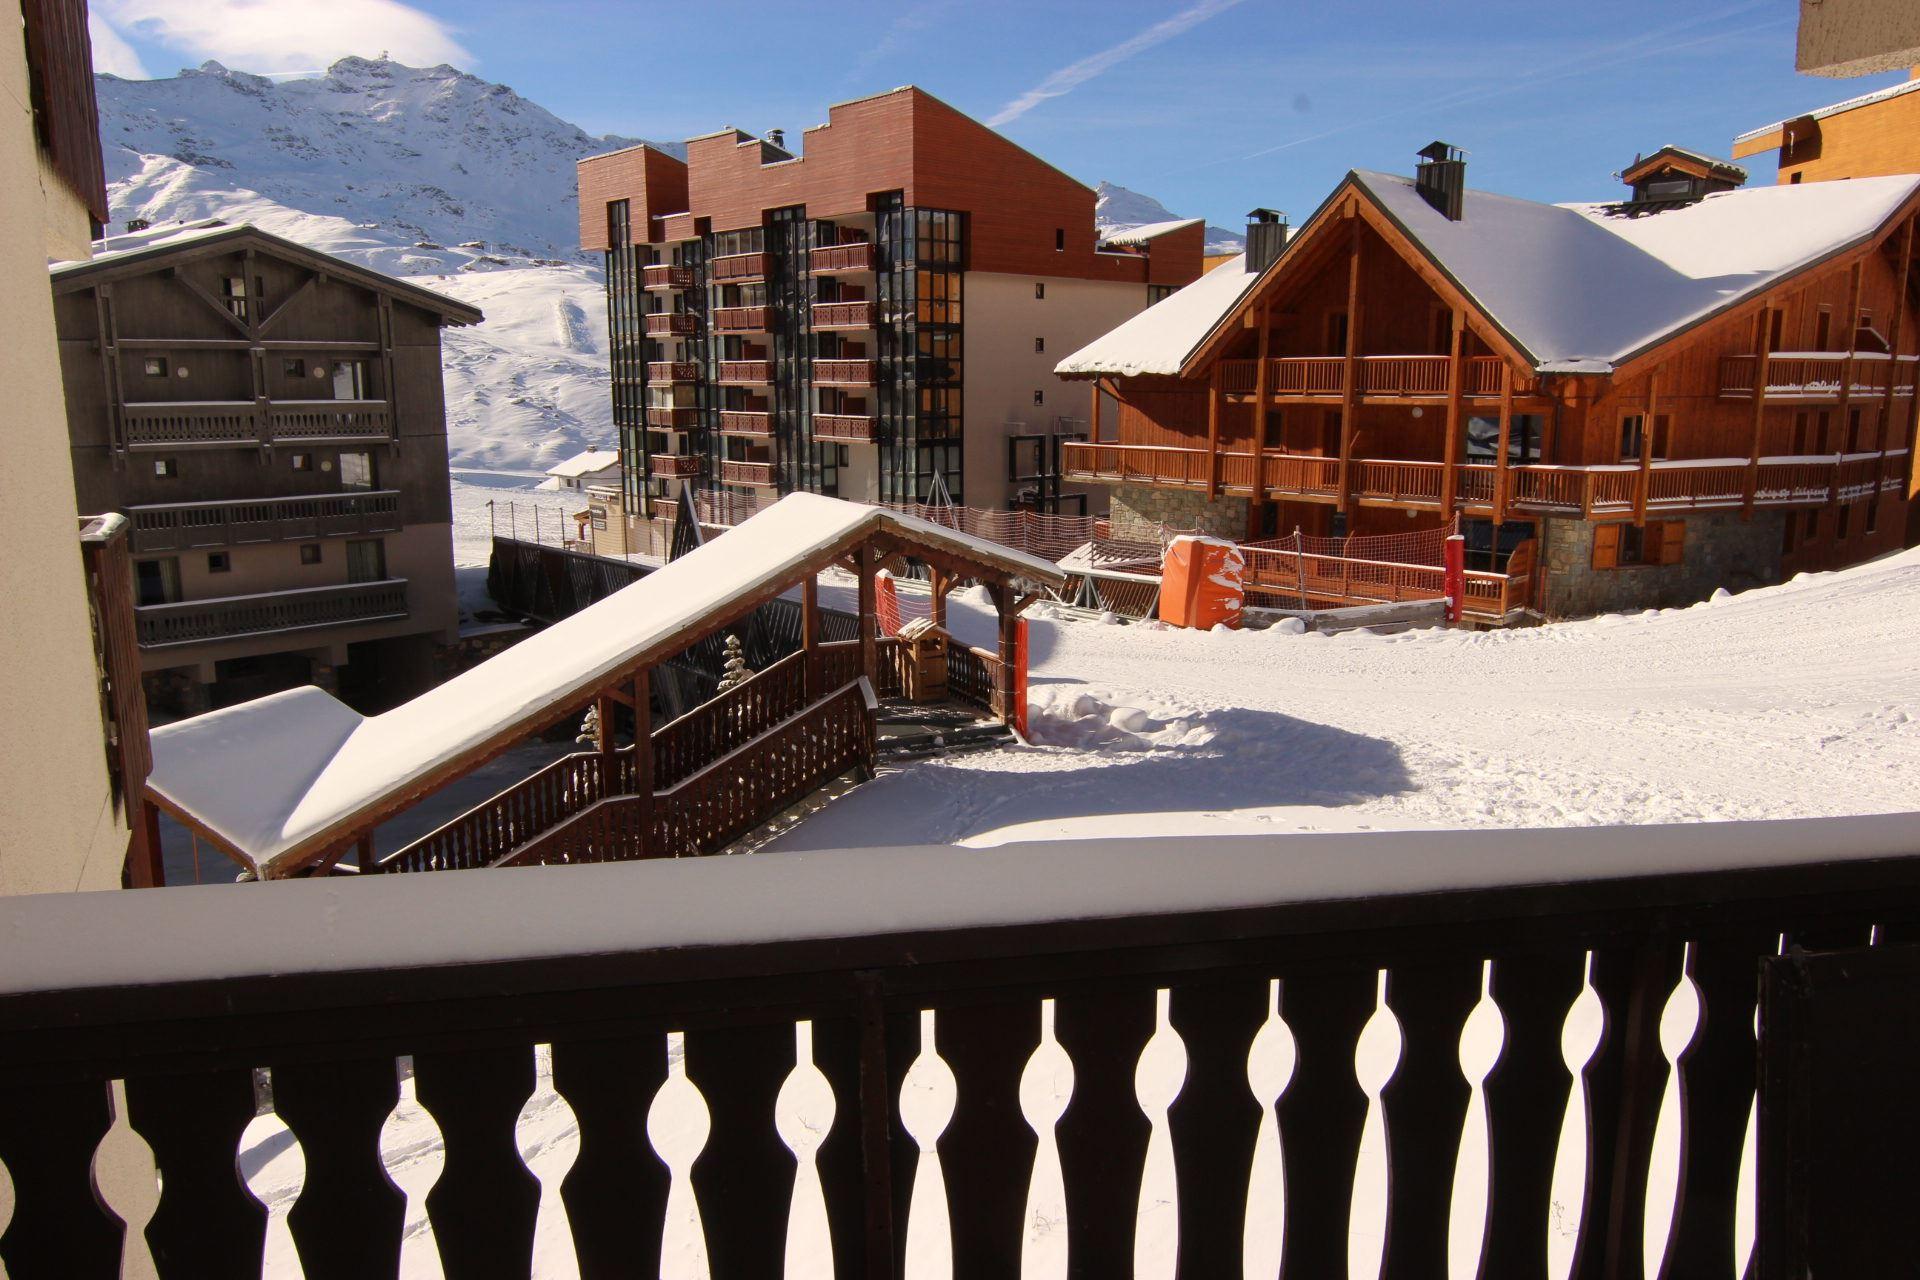 LAC DU LOU 101 / APARTMENT 2 ROOMS 5 PERSONS - 1 BRONZE SNOWFLAKE - VTI